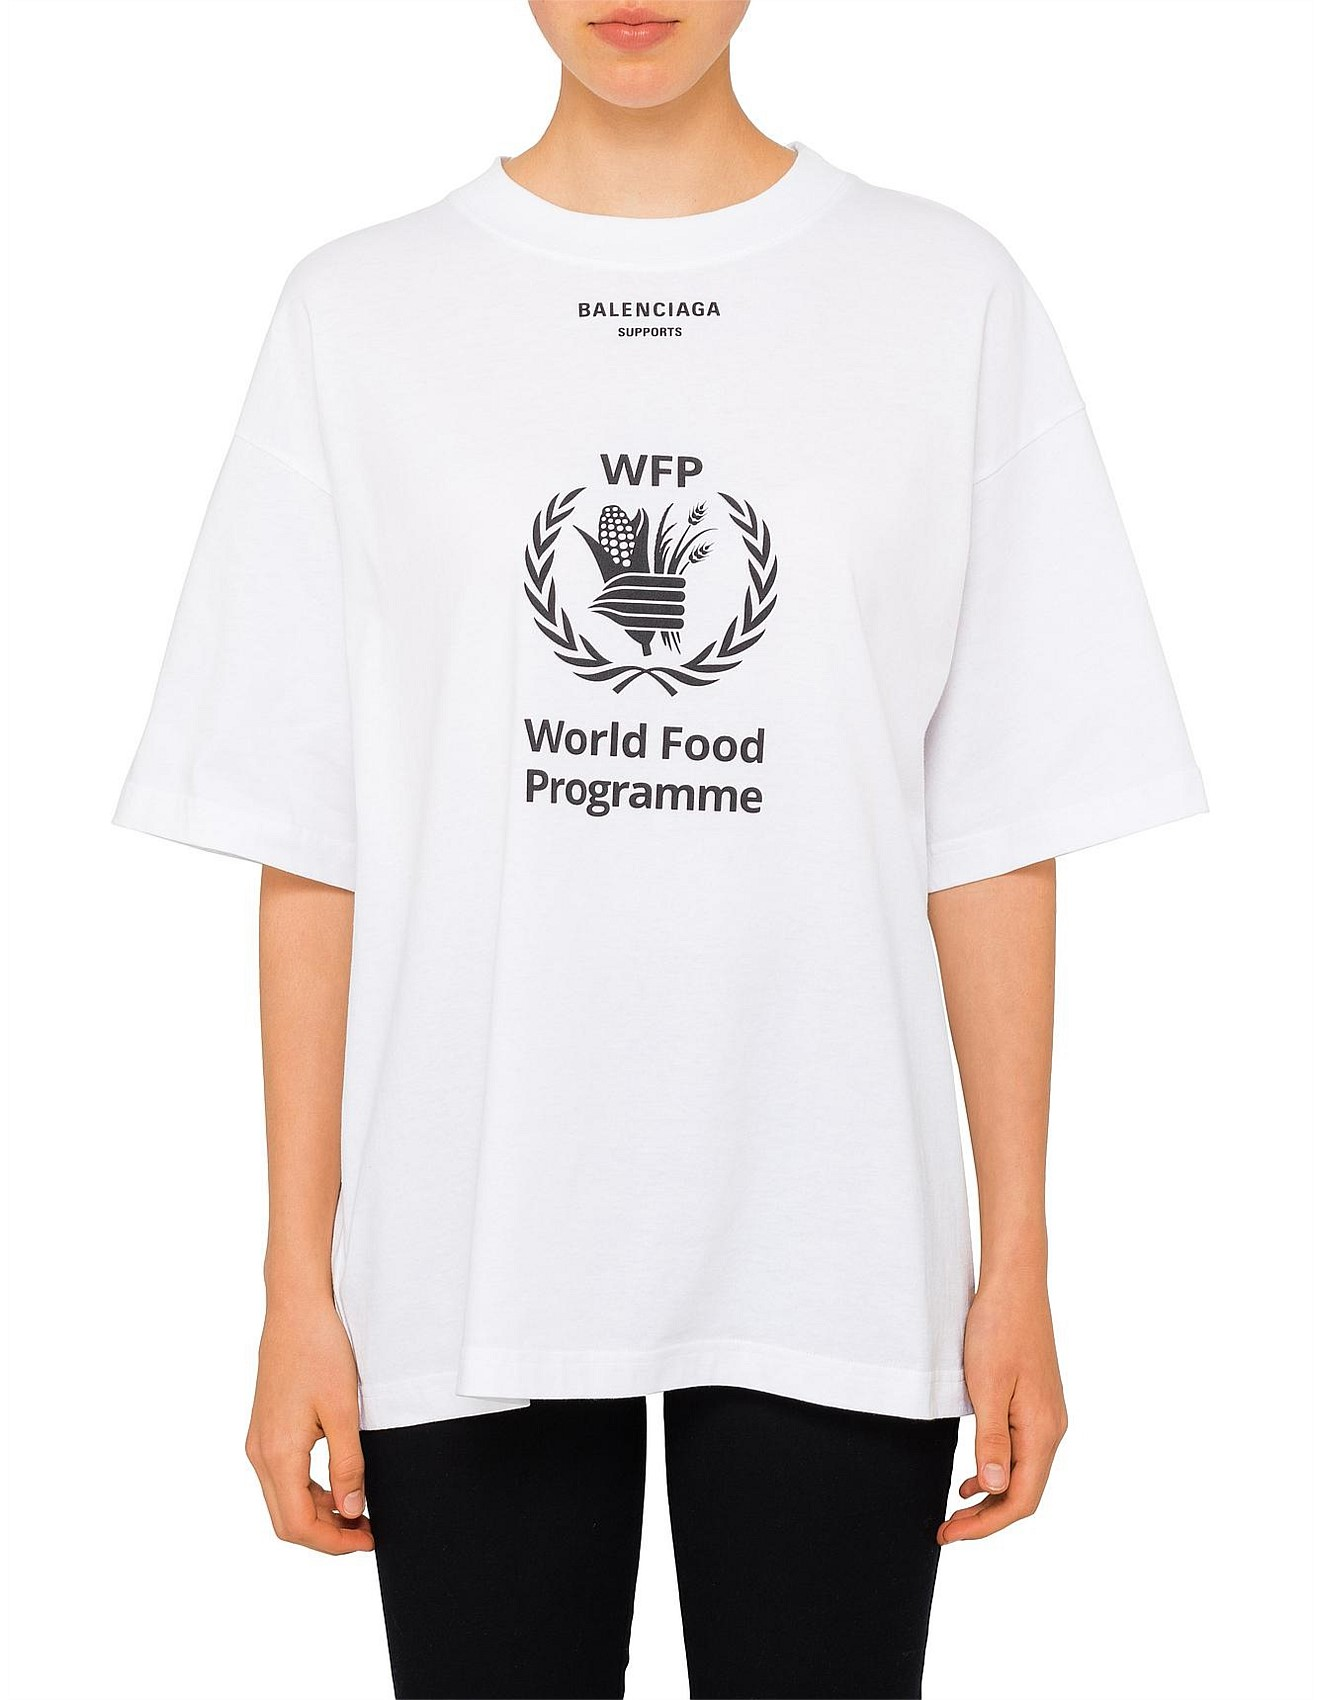 Women S Fashion Sale Women S Clothing Online David Jones World Food Programme T Shirt